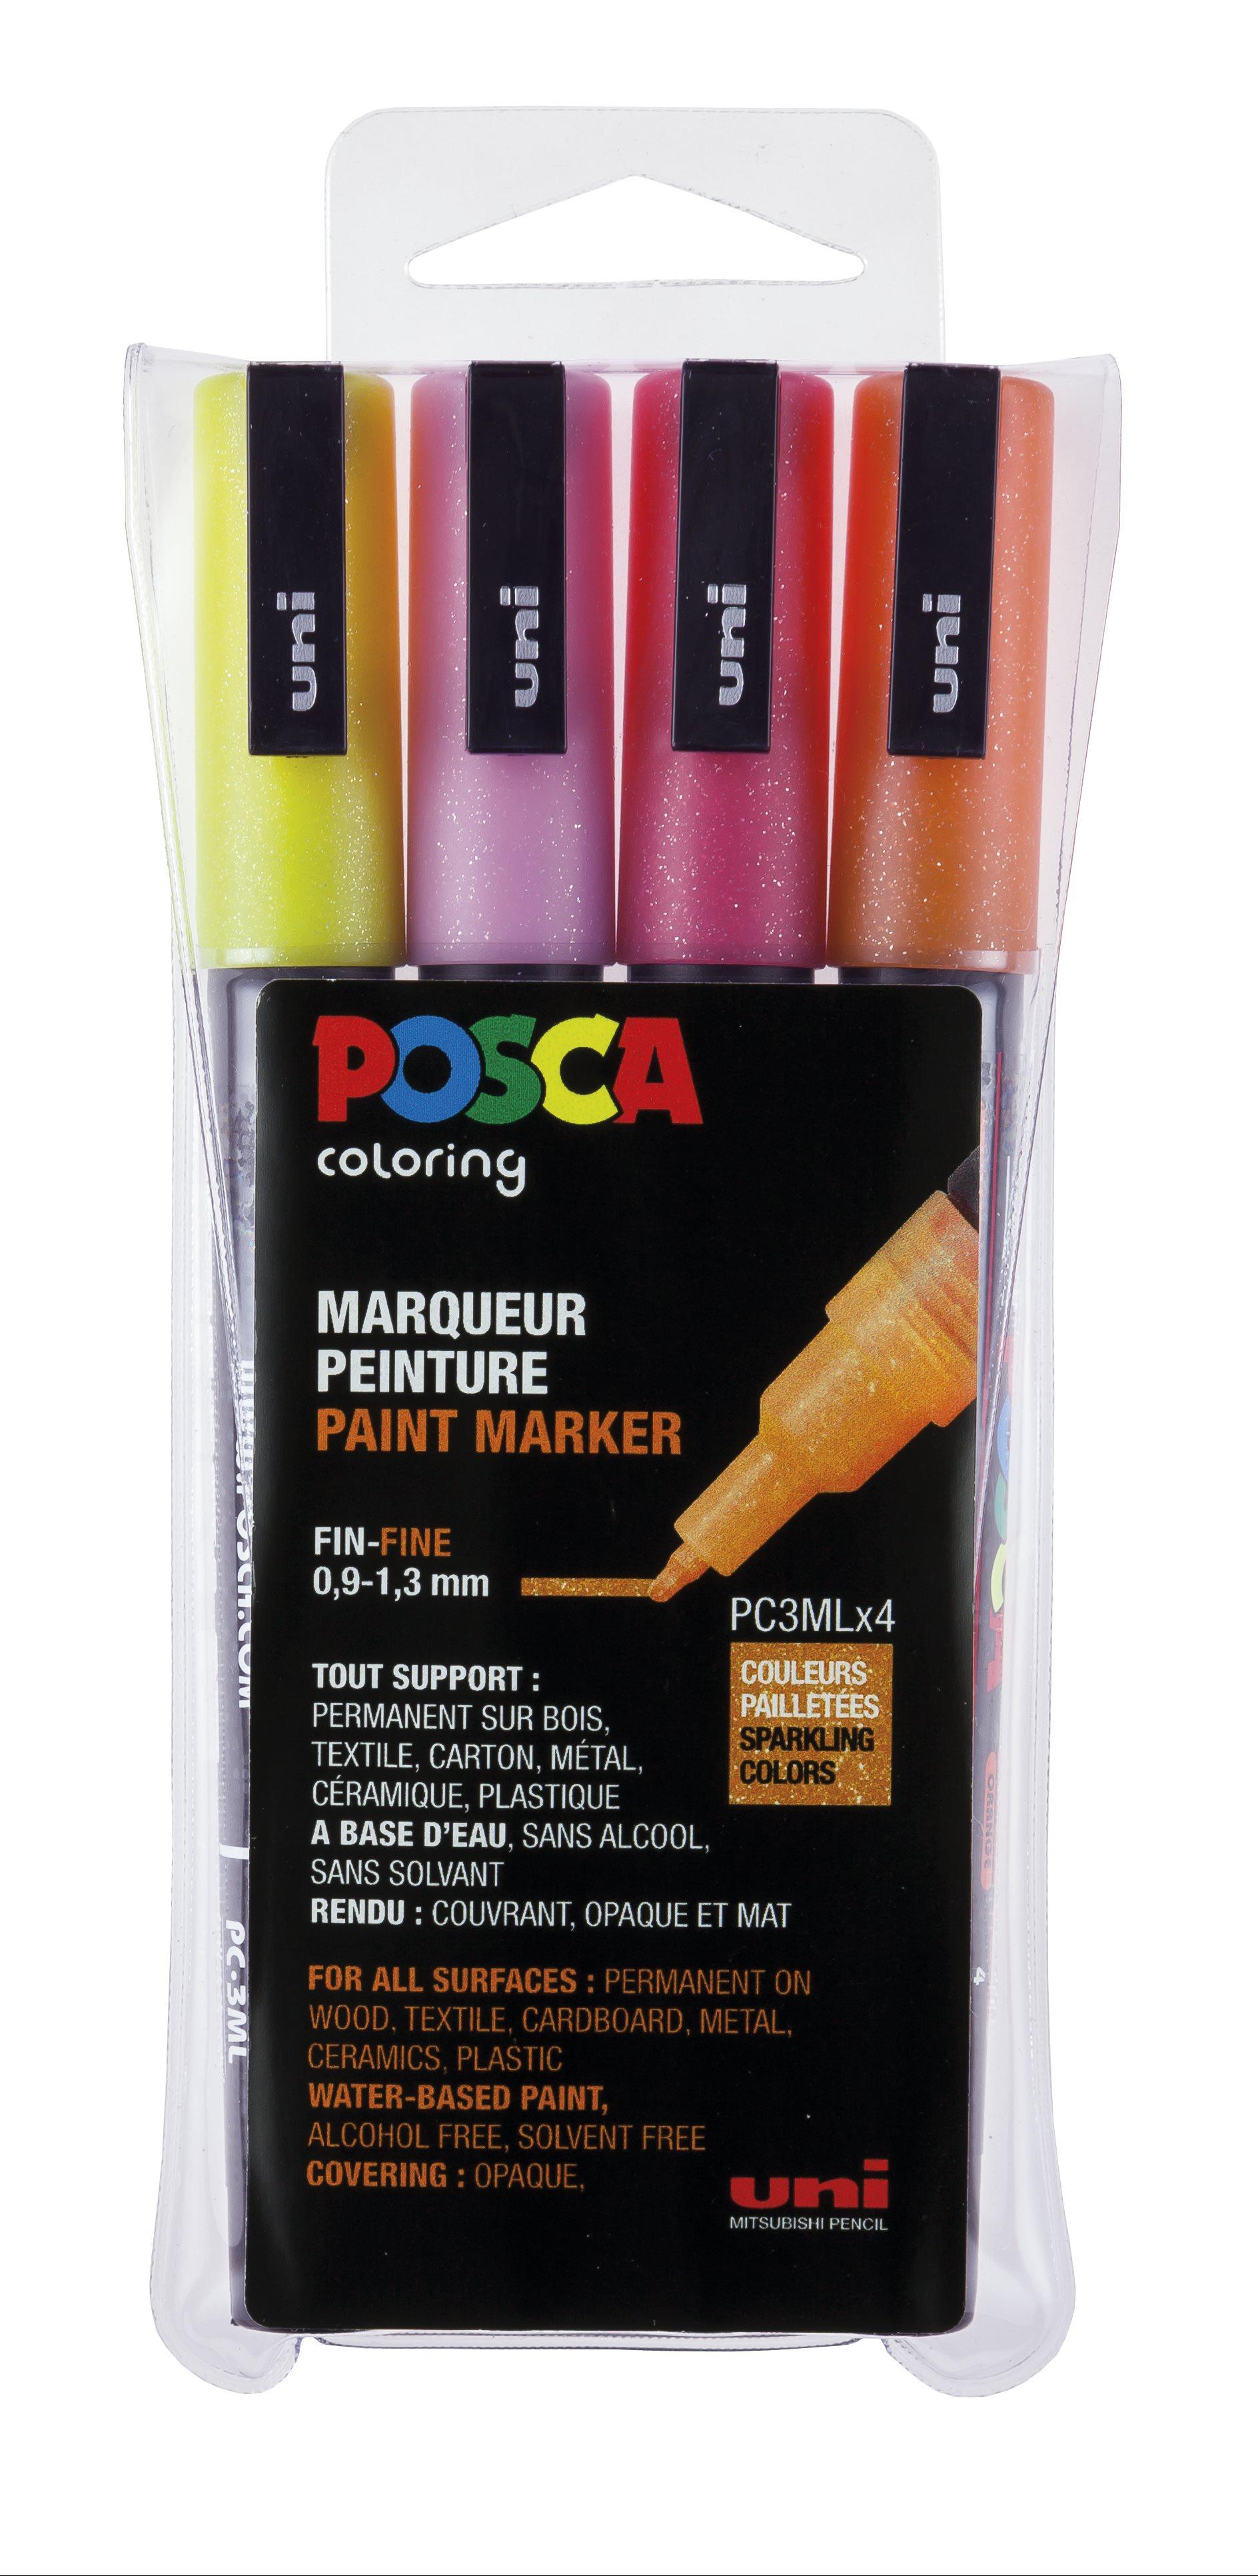 Posca - PC3M - Fine Tip Pen - Glitter pink, 4 pc